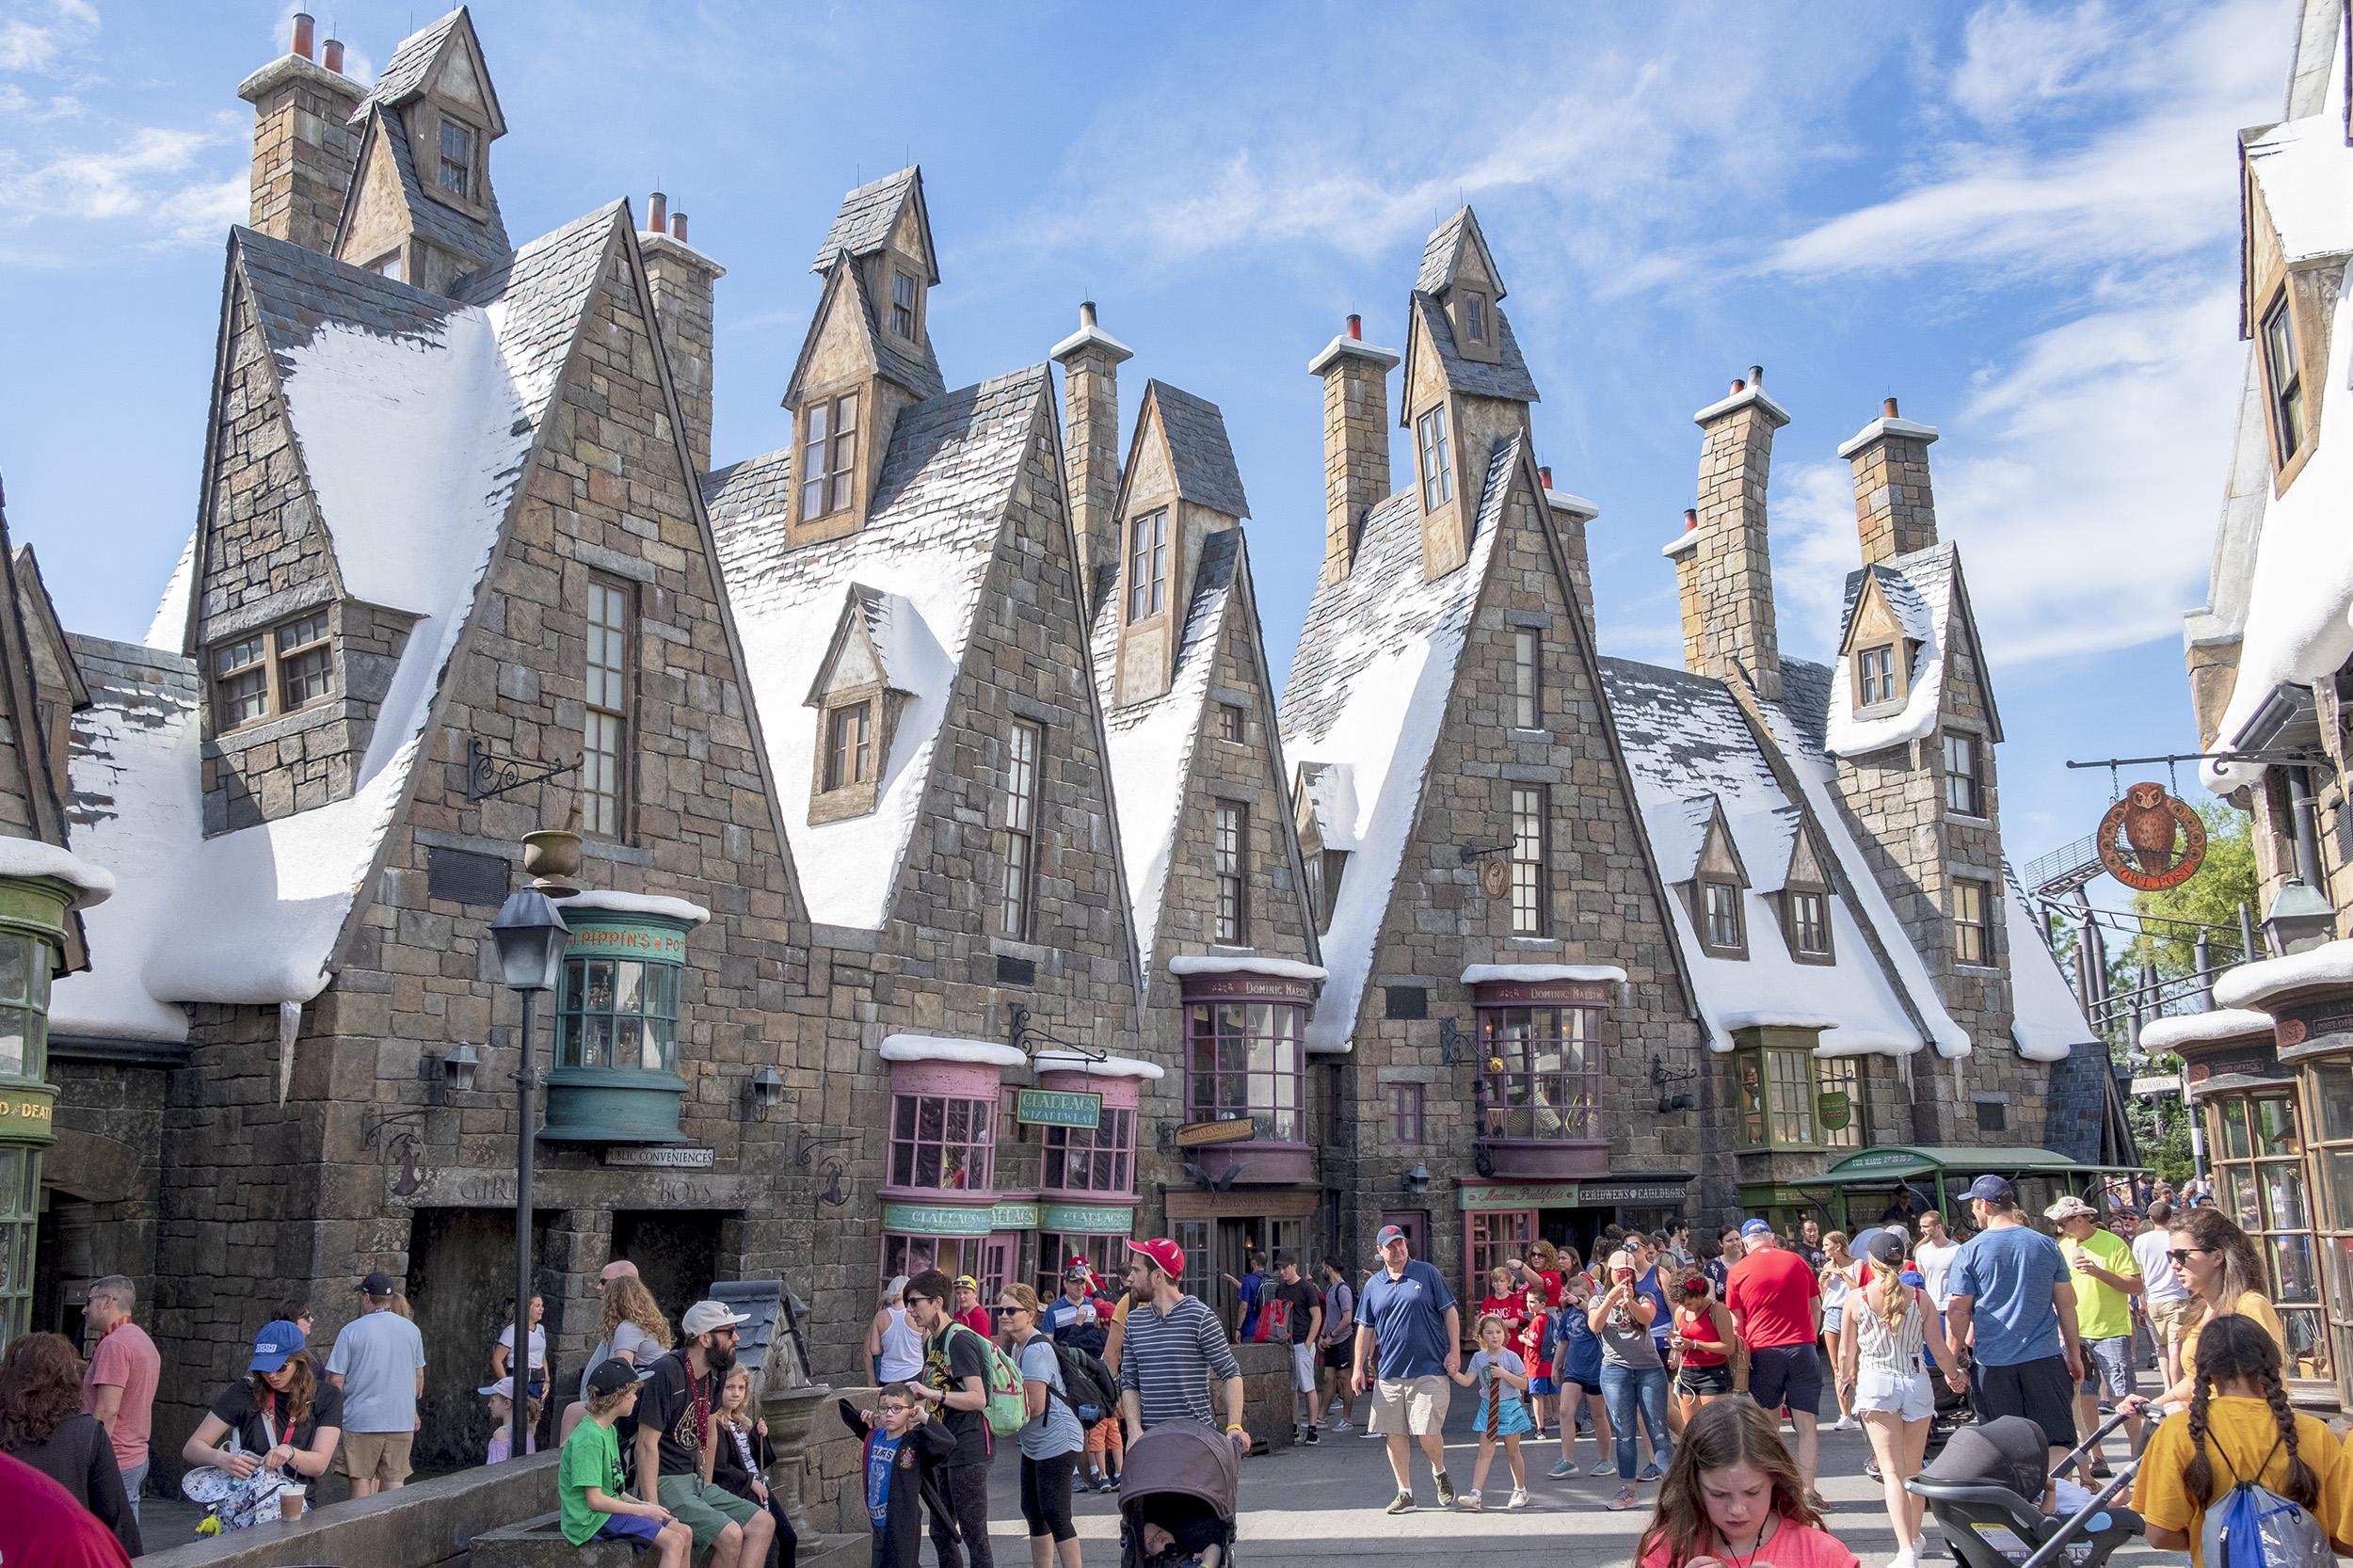 Hogsmeade Village. The wizarding world of harry potter.